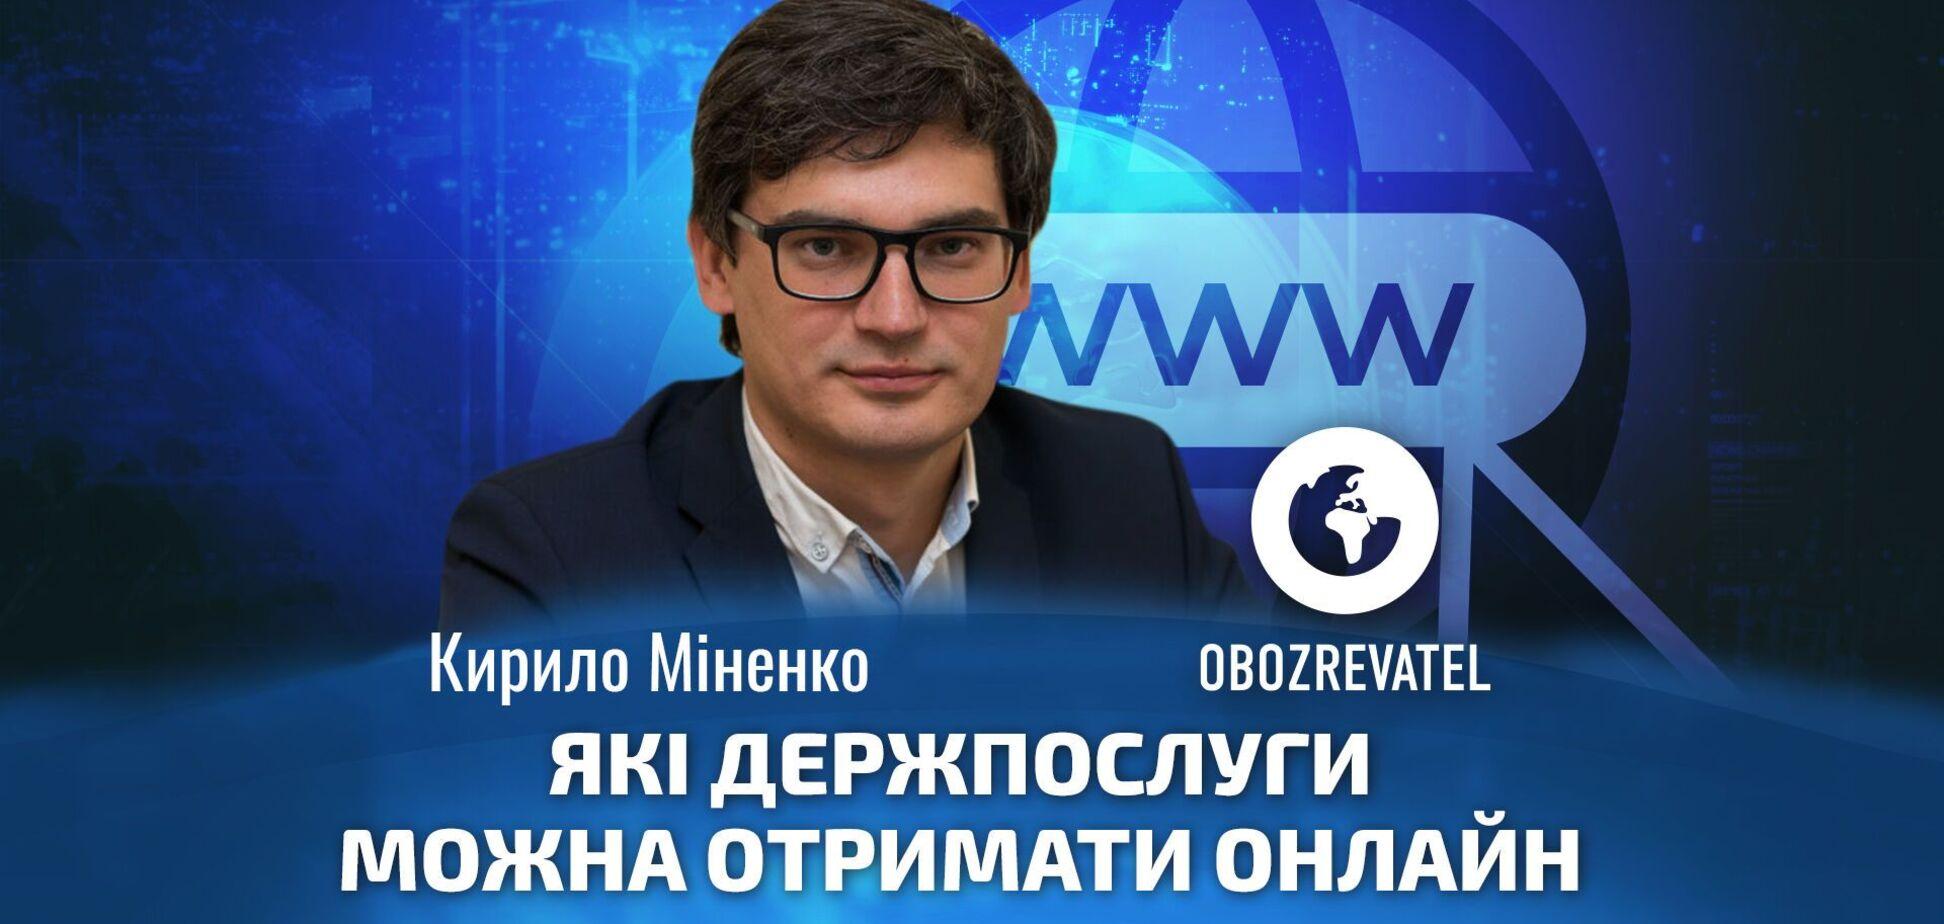 Услуги в смартфоне во время локдауна: в Минюсте назвали опции